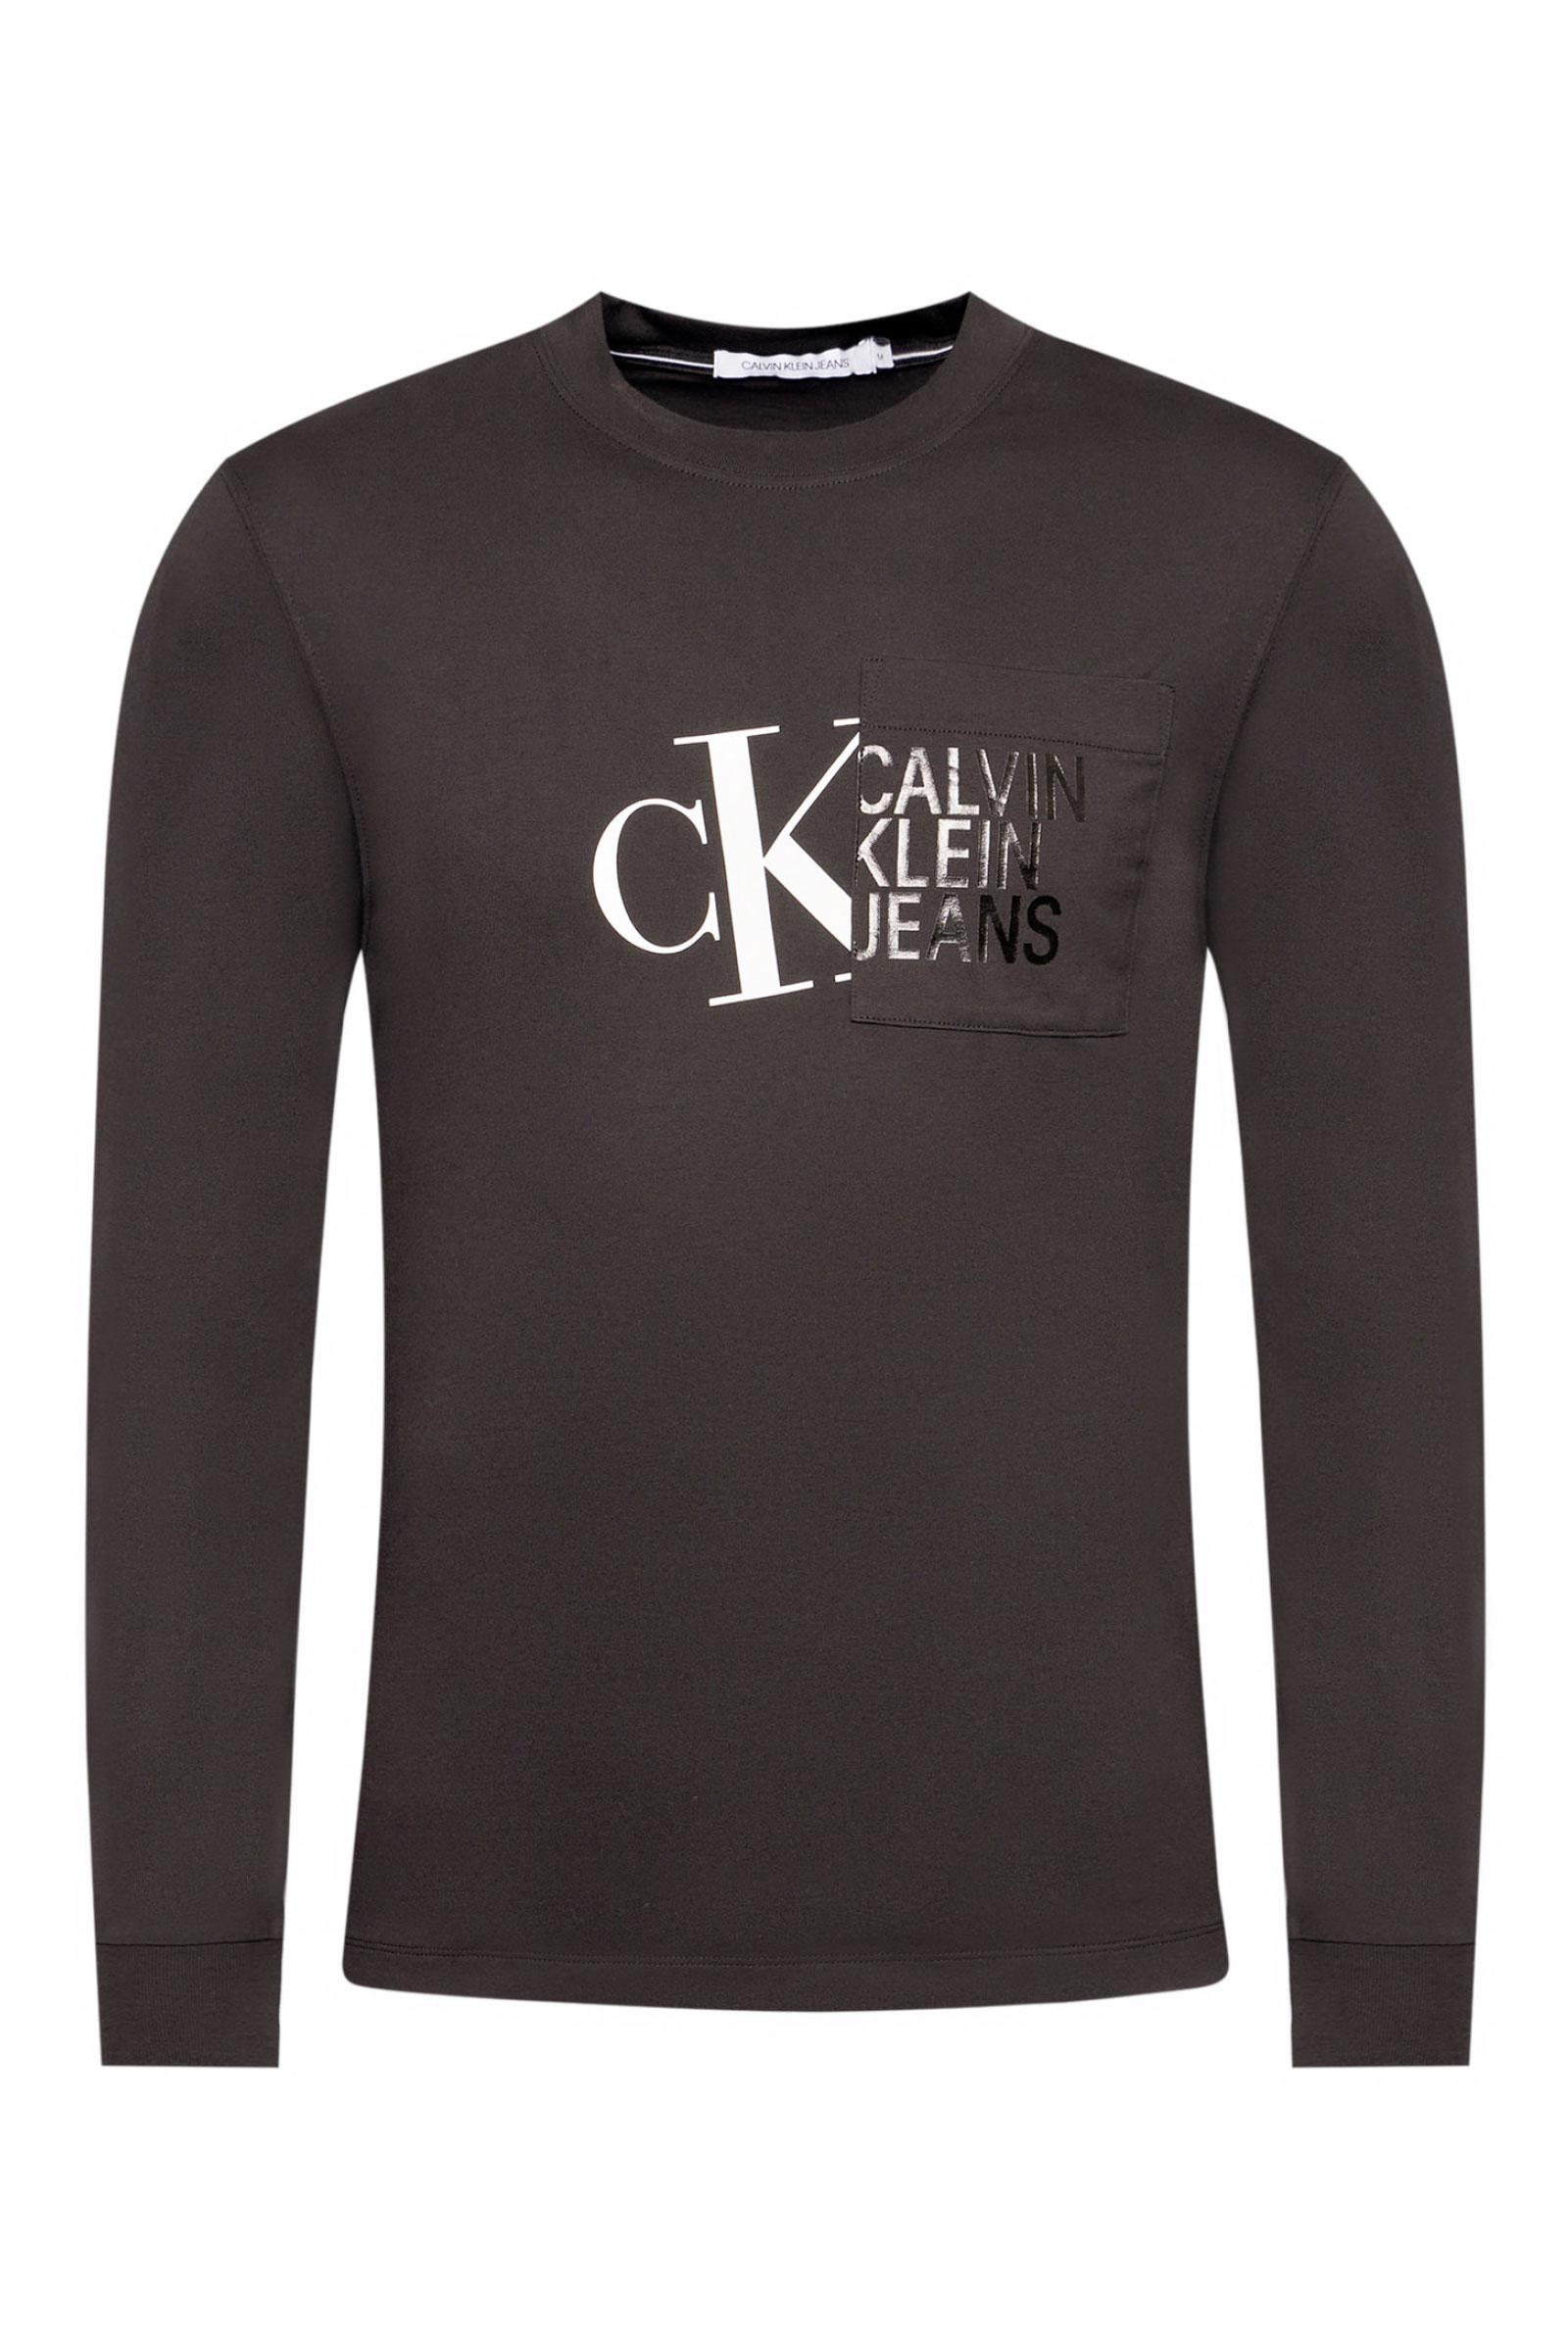 CALVIN KLEIN JEANS T-Shirt Uomo CALVIN KLEIN JEANS   T-Shirt   J30J317454BEH